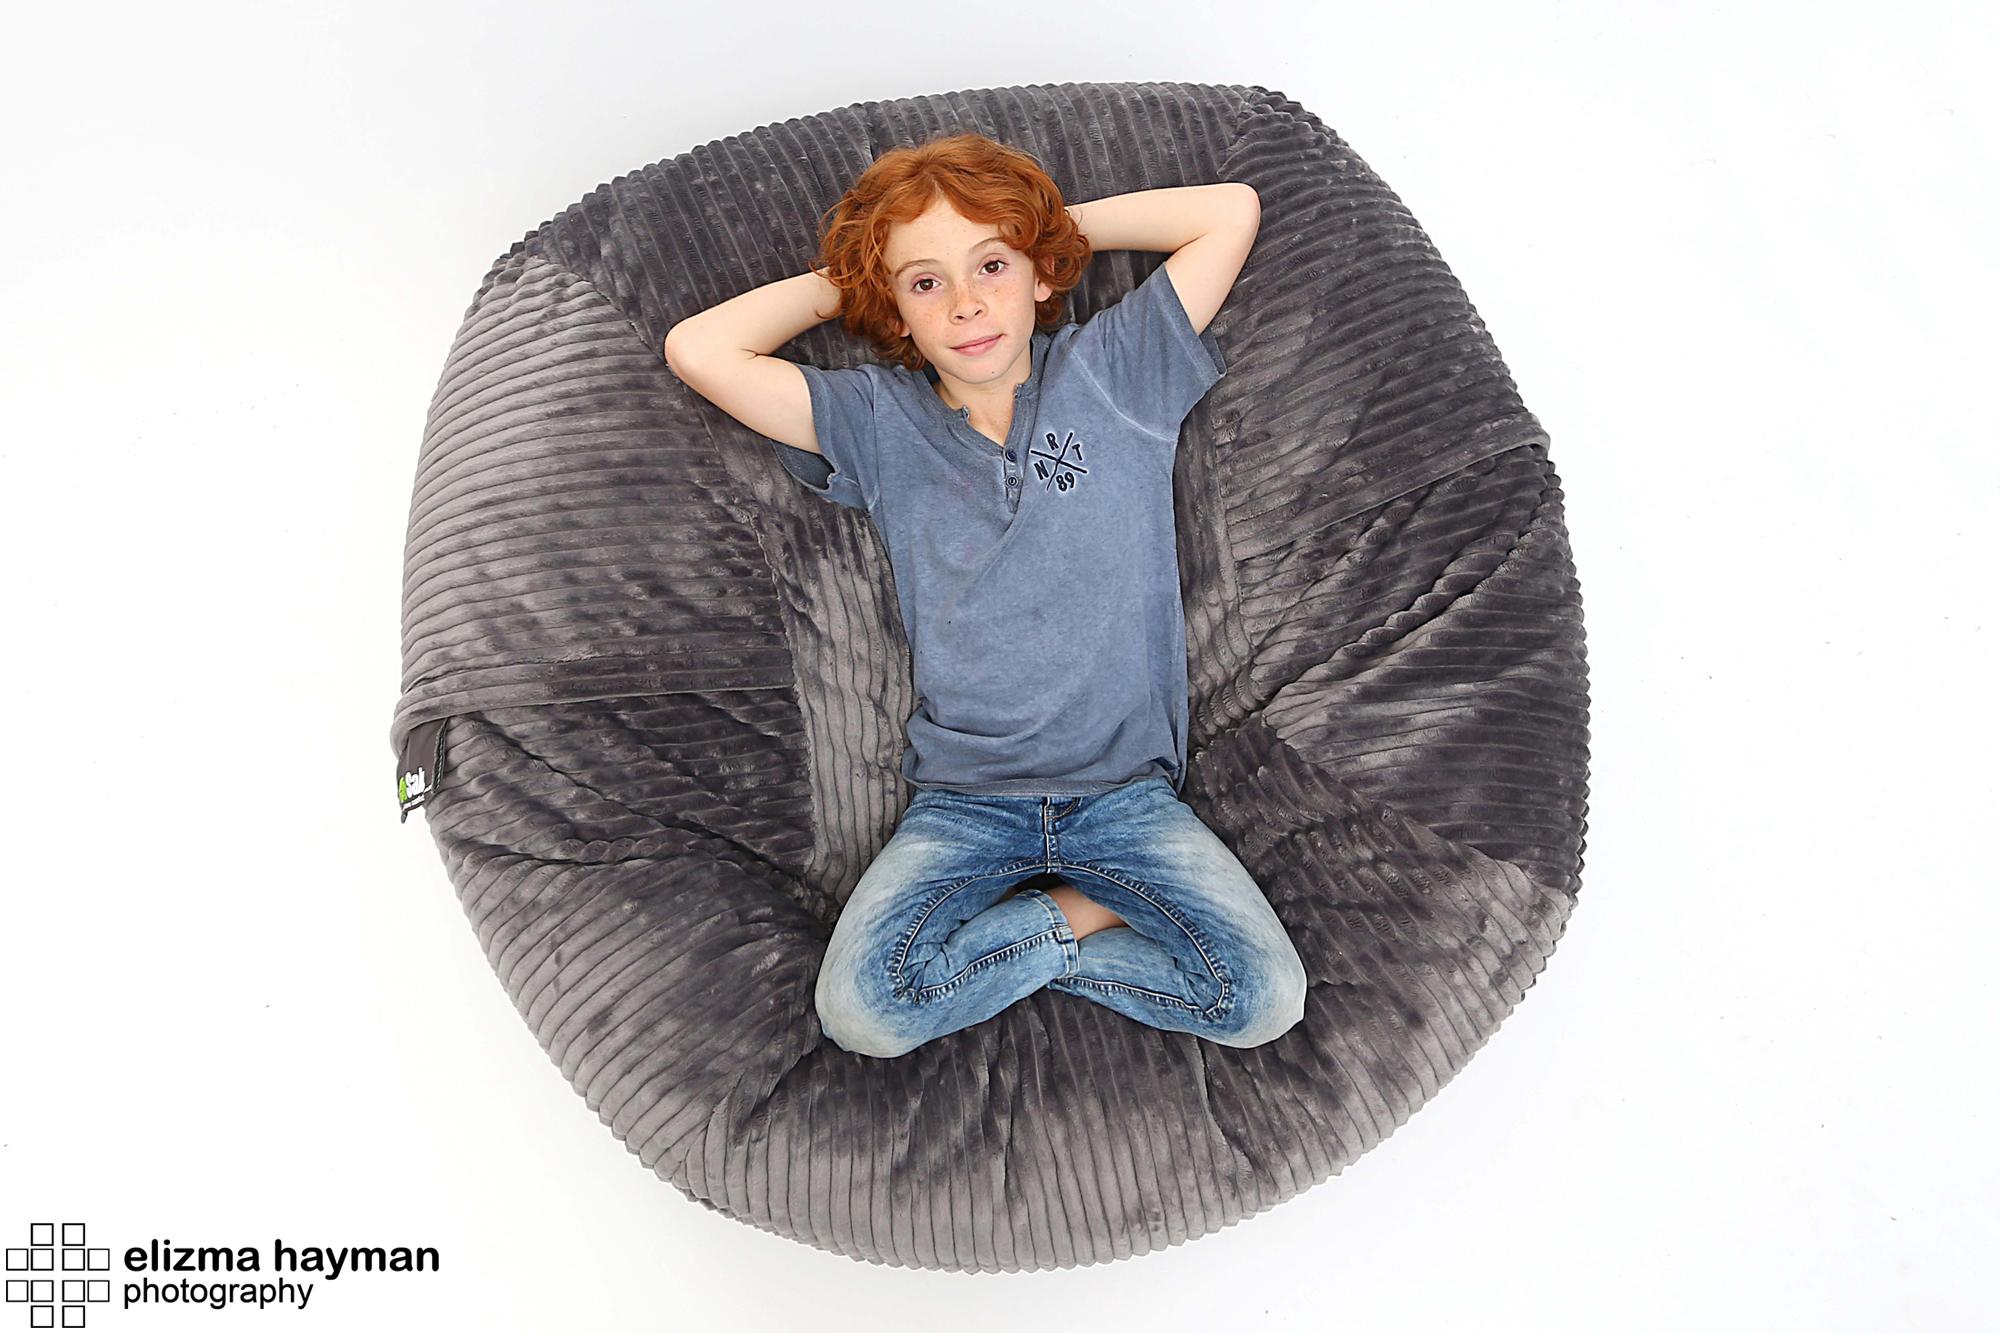 elizma hayman product photography